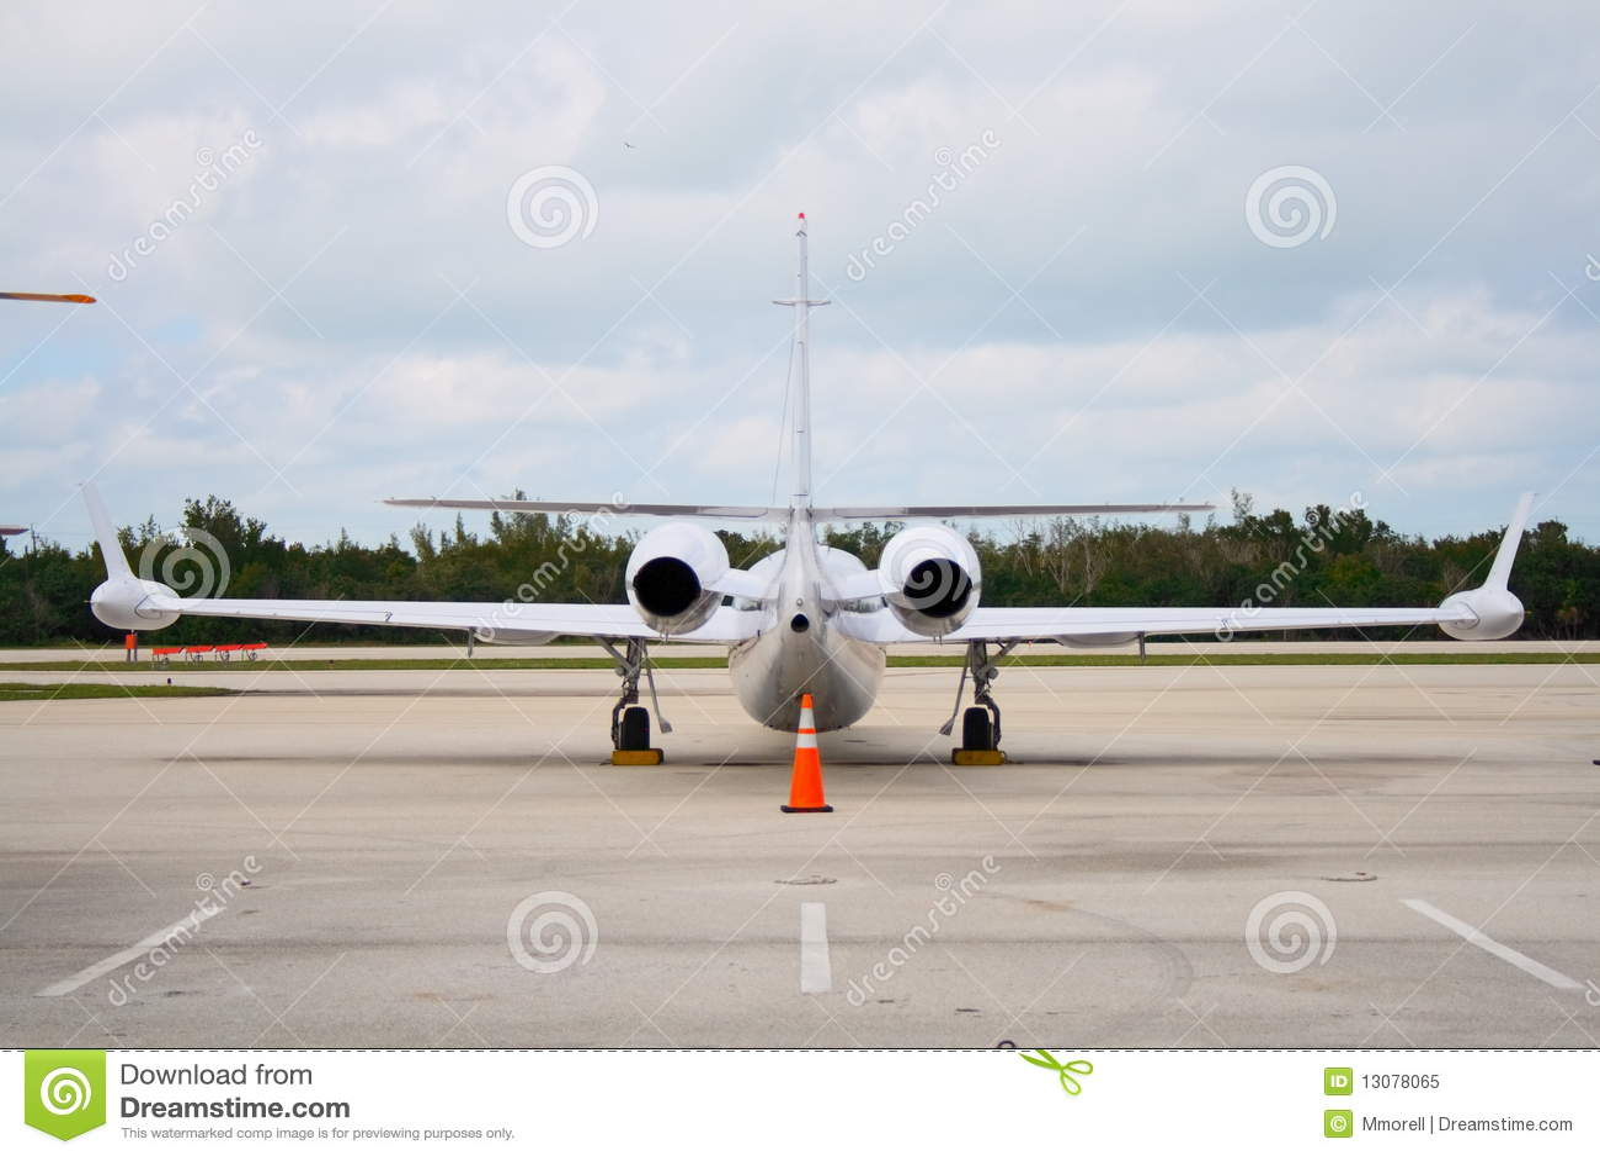 back of jet plane royalty free stock photo image 13078065